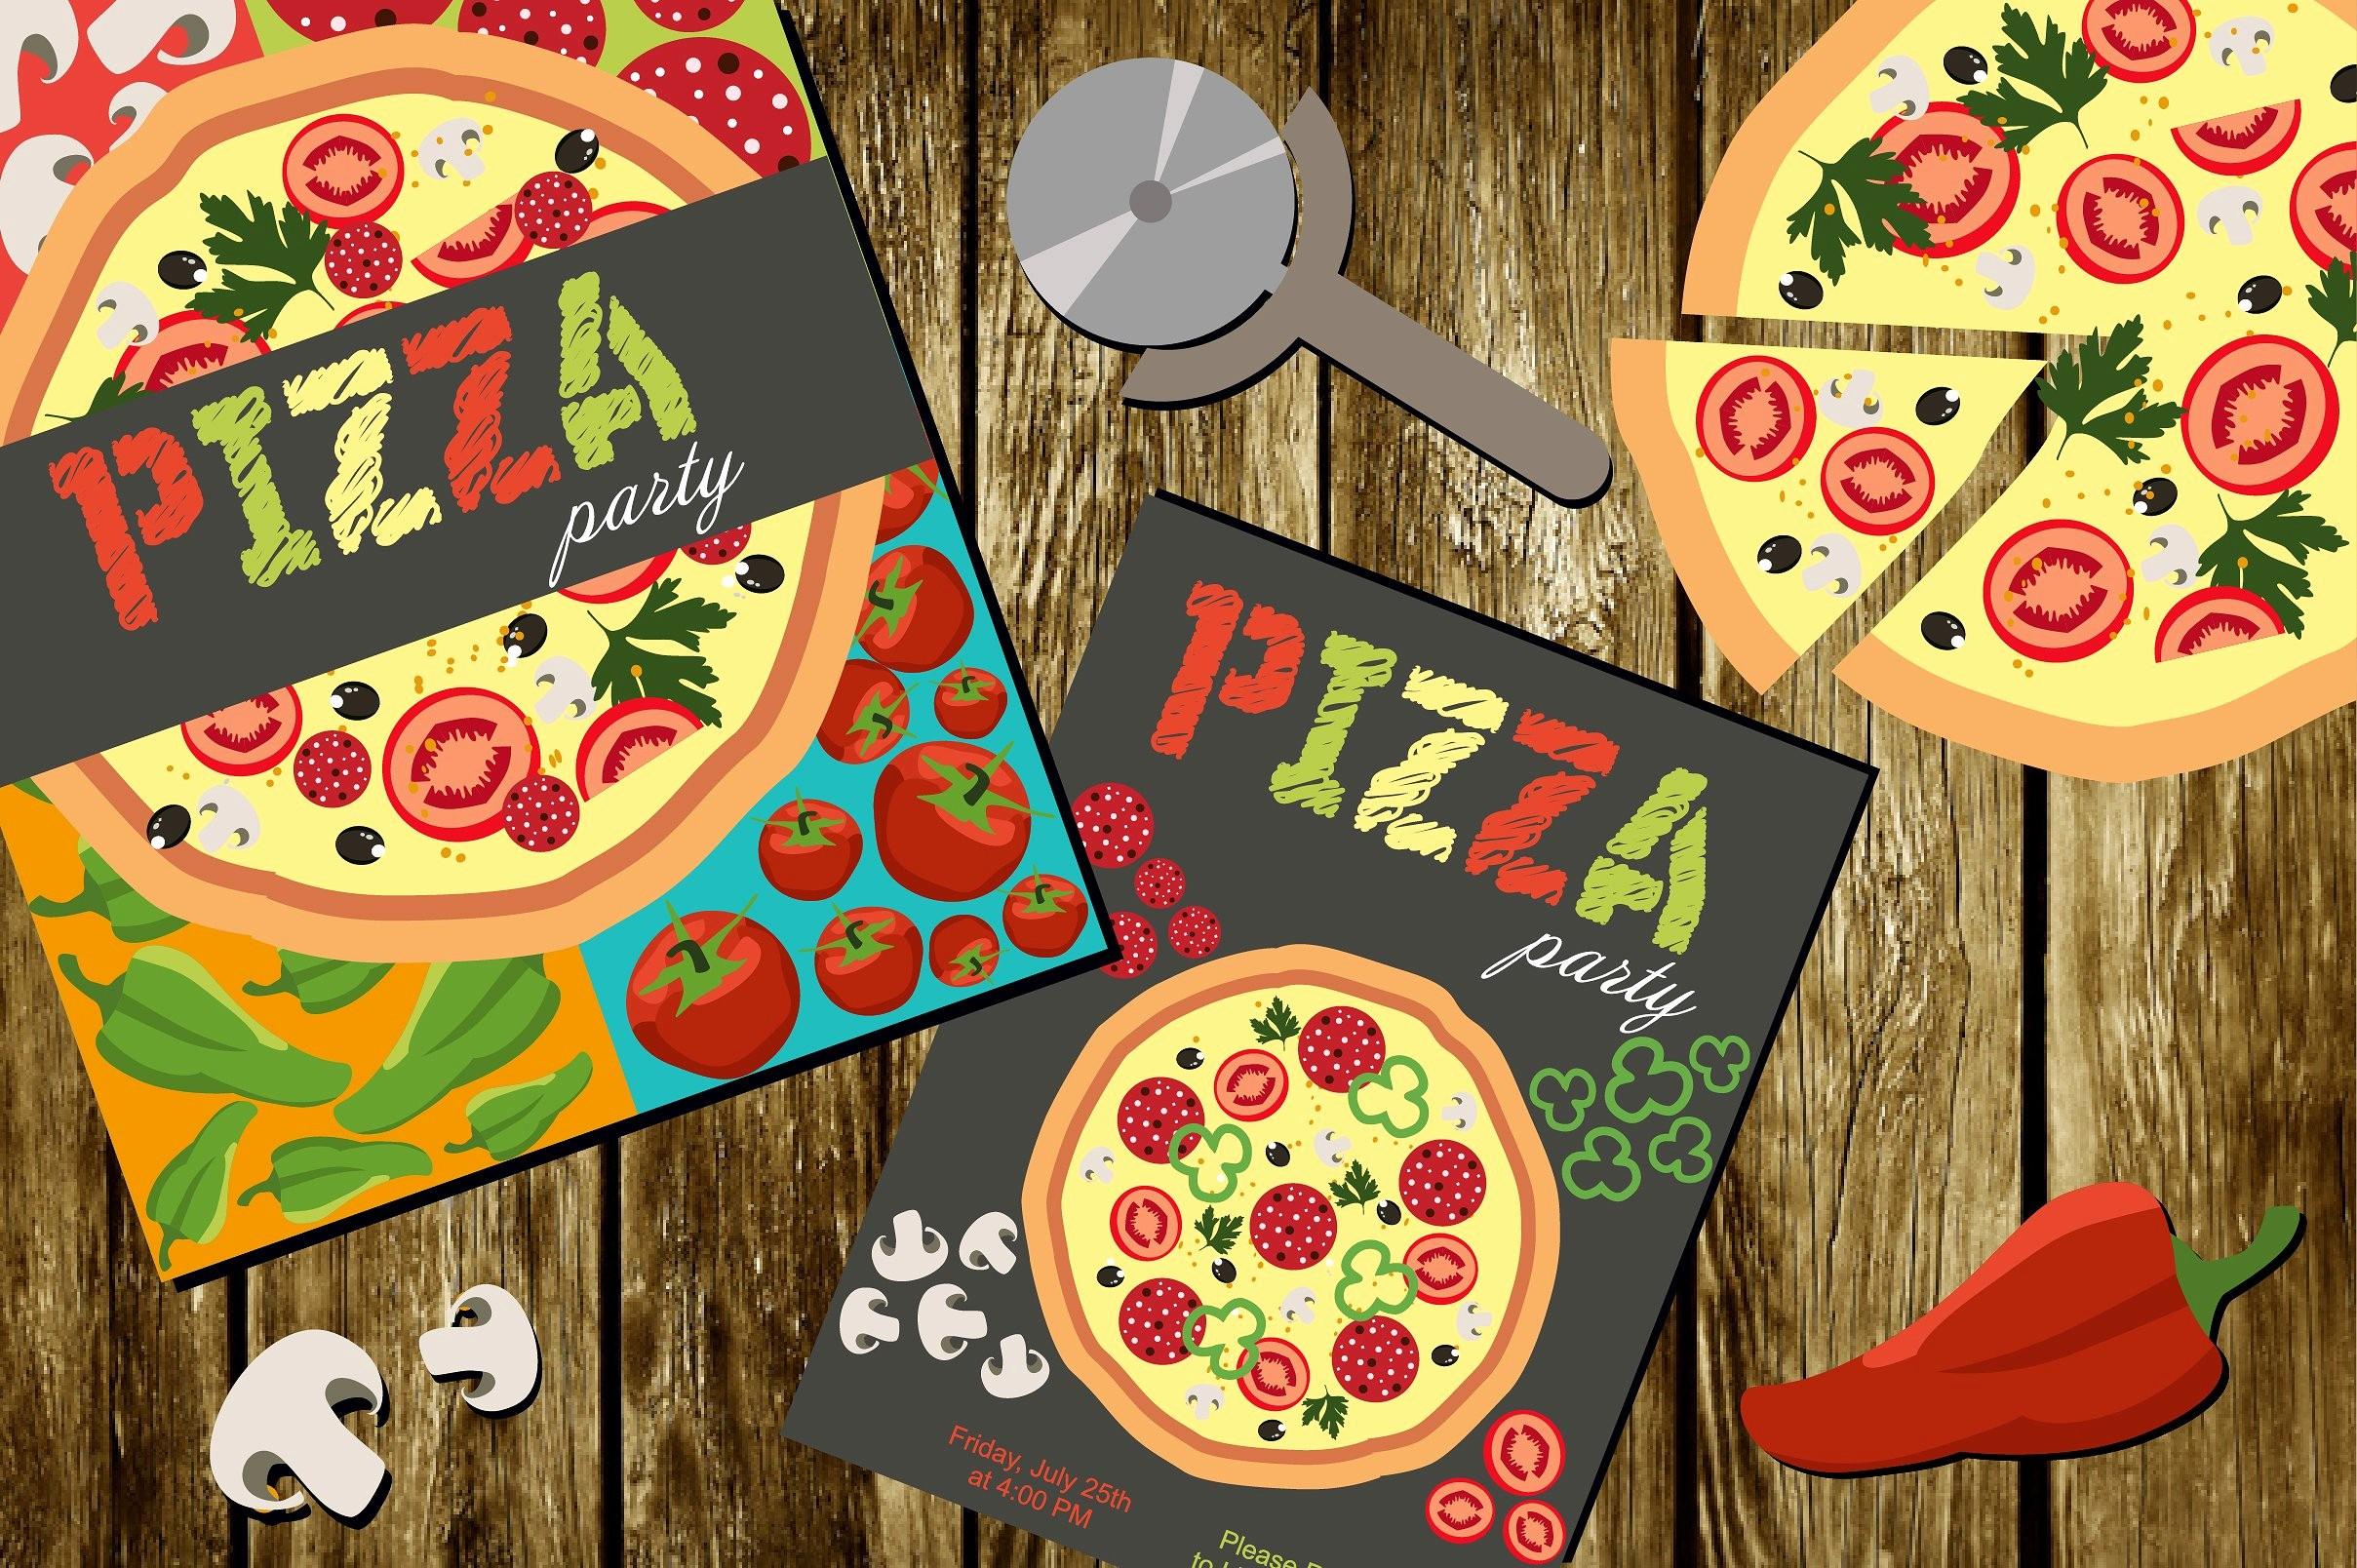 Pizza Party Flyer Template Free Unique Pizza Party Illustrations Creative Market